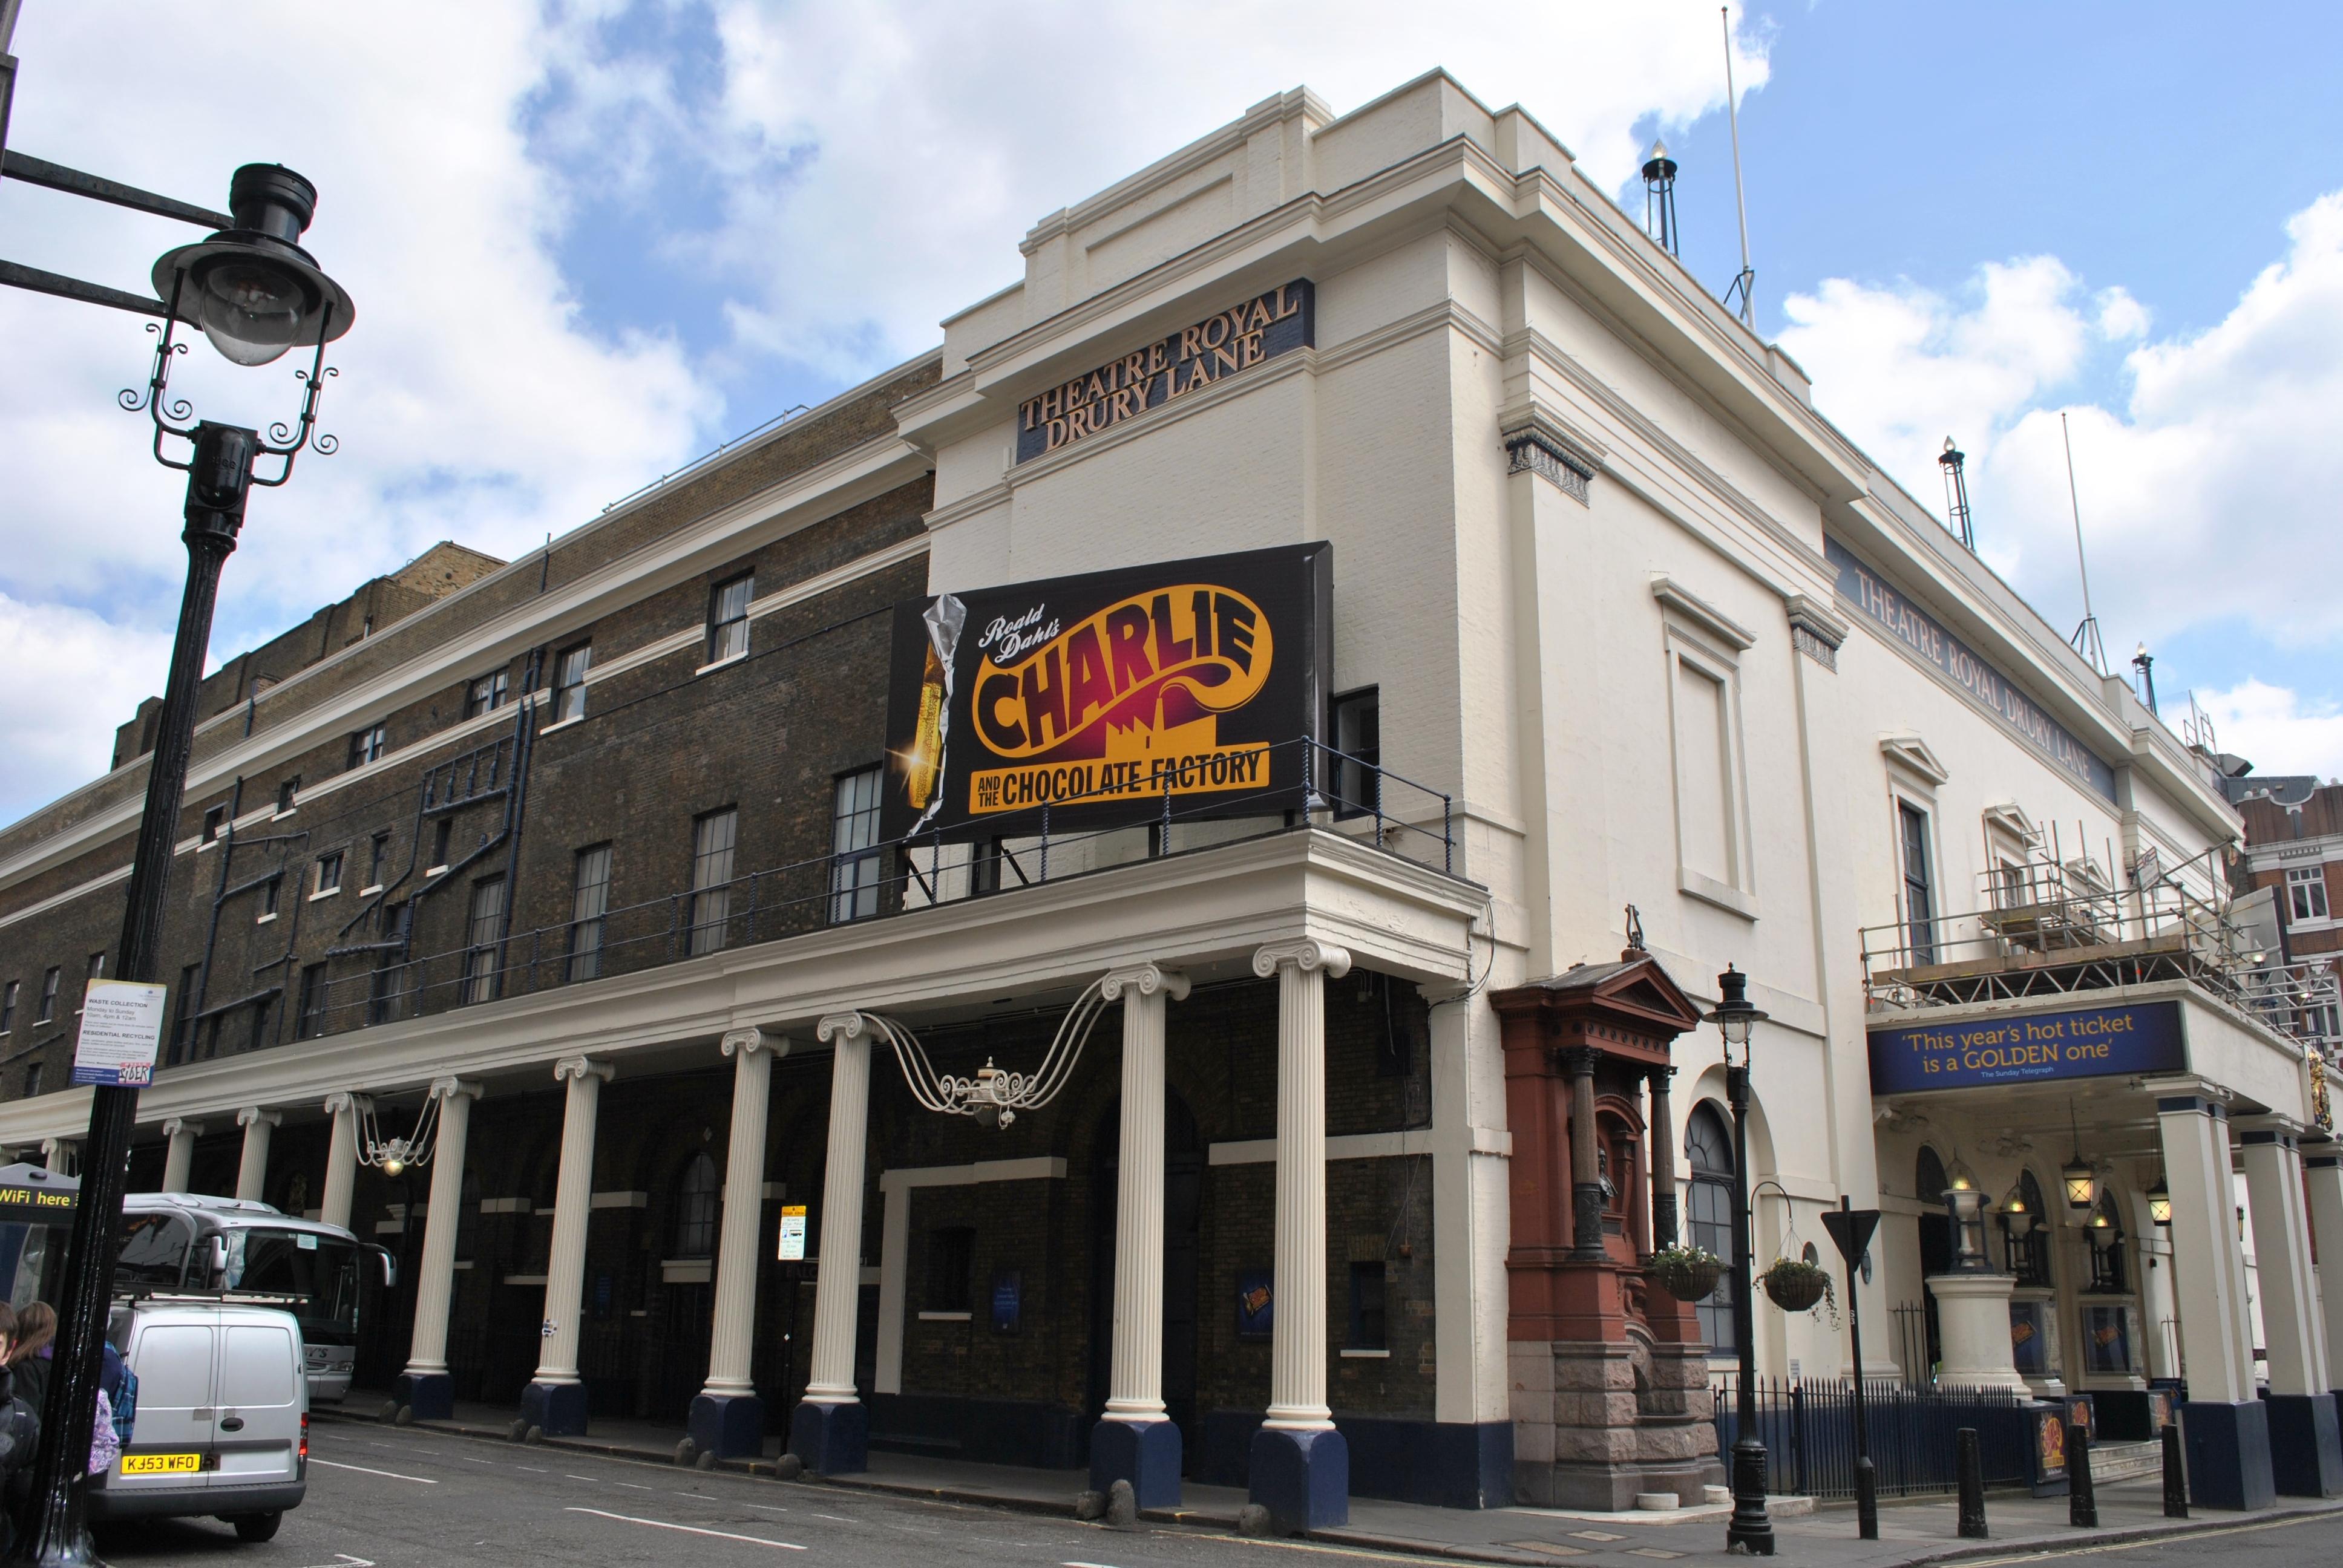 Theatre Royal, Drury Lane - Wikipedia